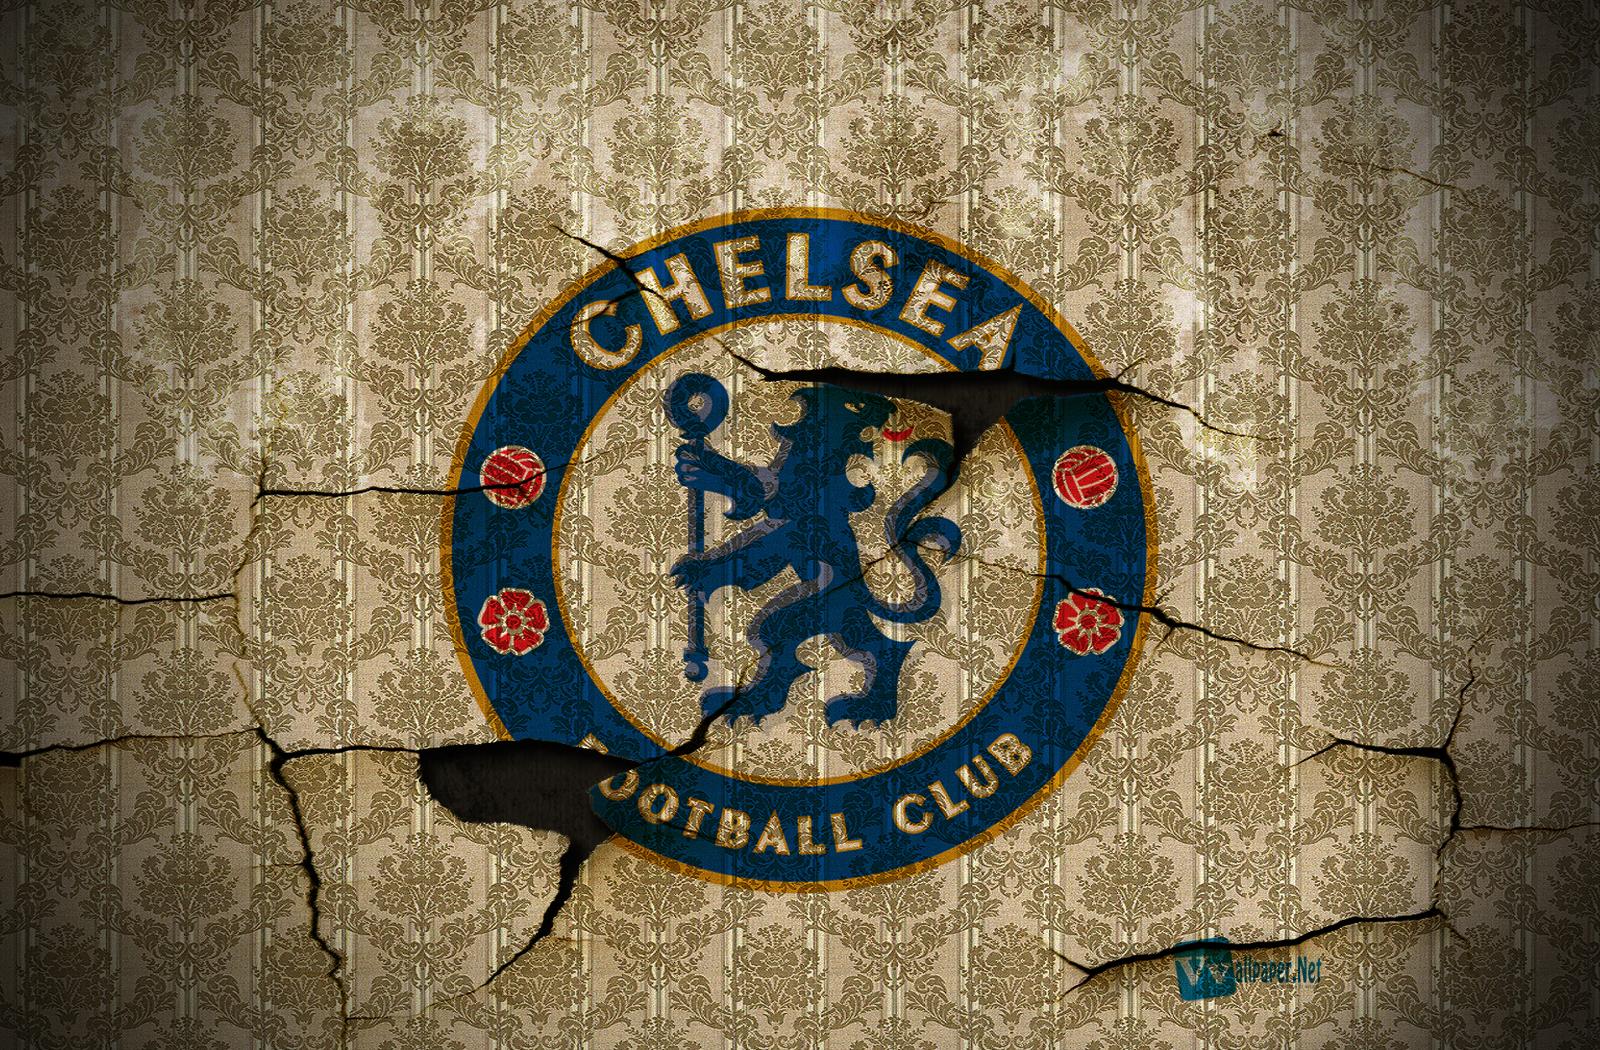 Chelsea fc soccer fresh hd wallpaper 2013 all football - Chelsea wallpaper 2018 hd ...